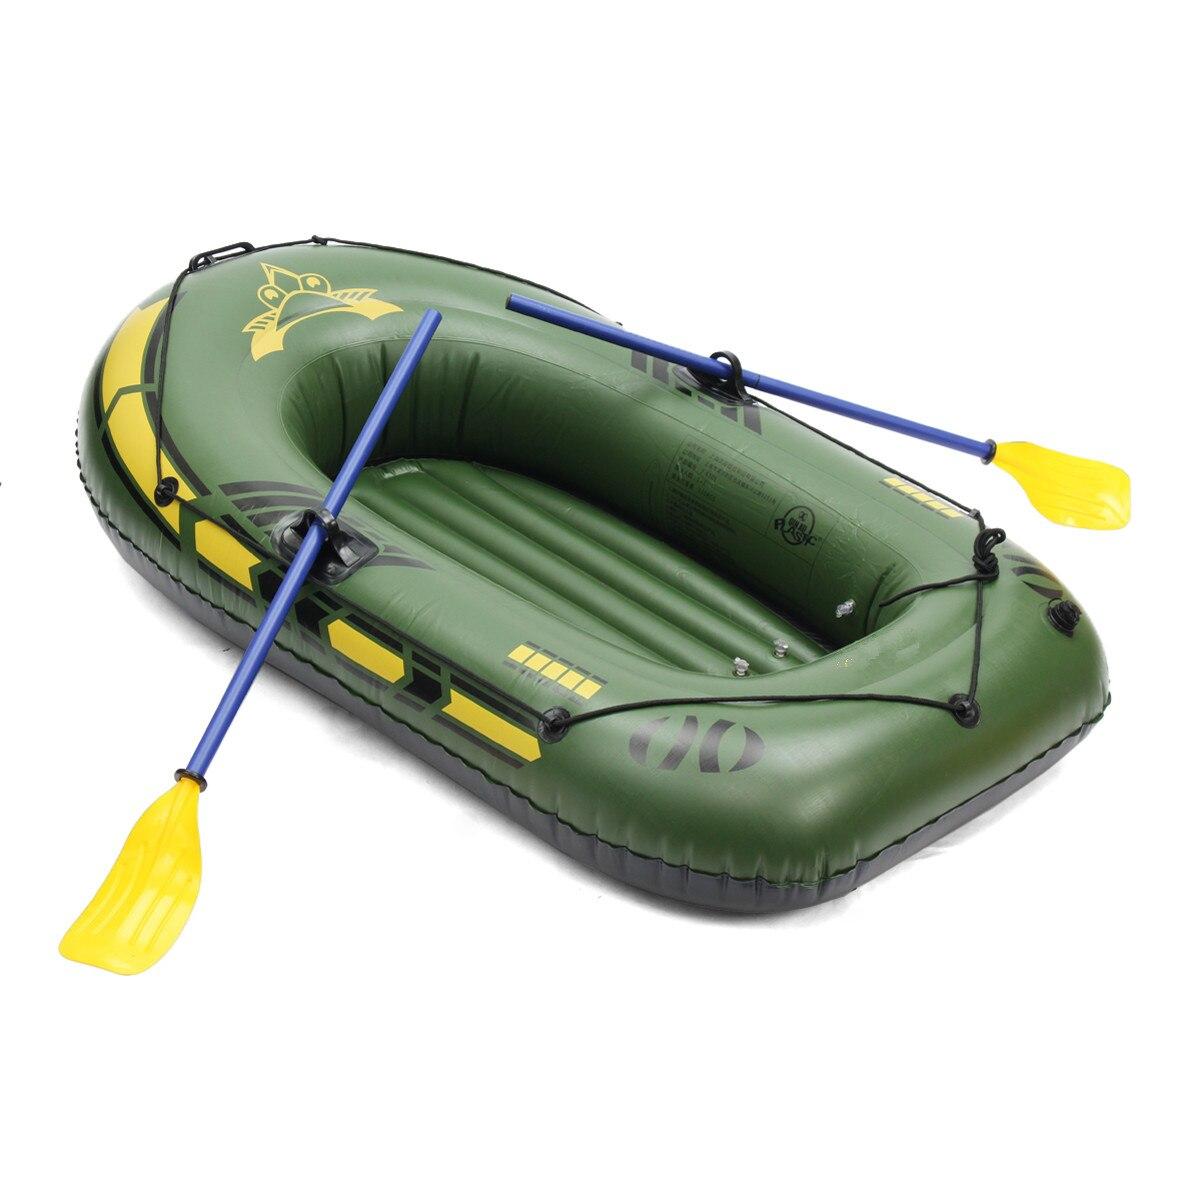 SGODDE 2 personas/3 personas engrosamiento PVC bote inflable balsa río lago bote de pesca con remos Set de carga 200kg - 6